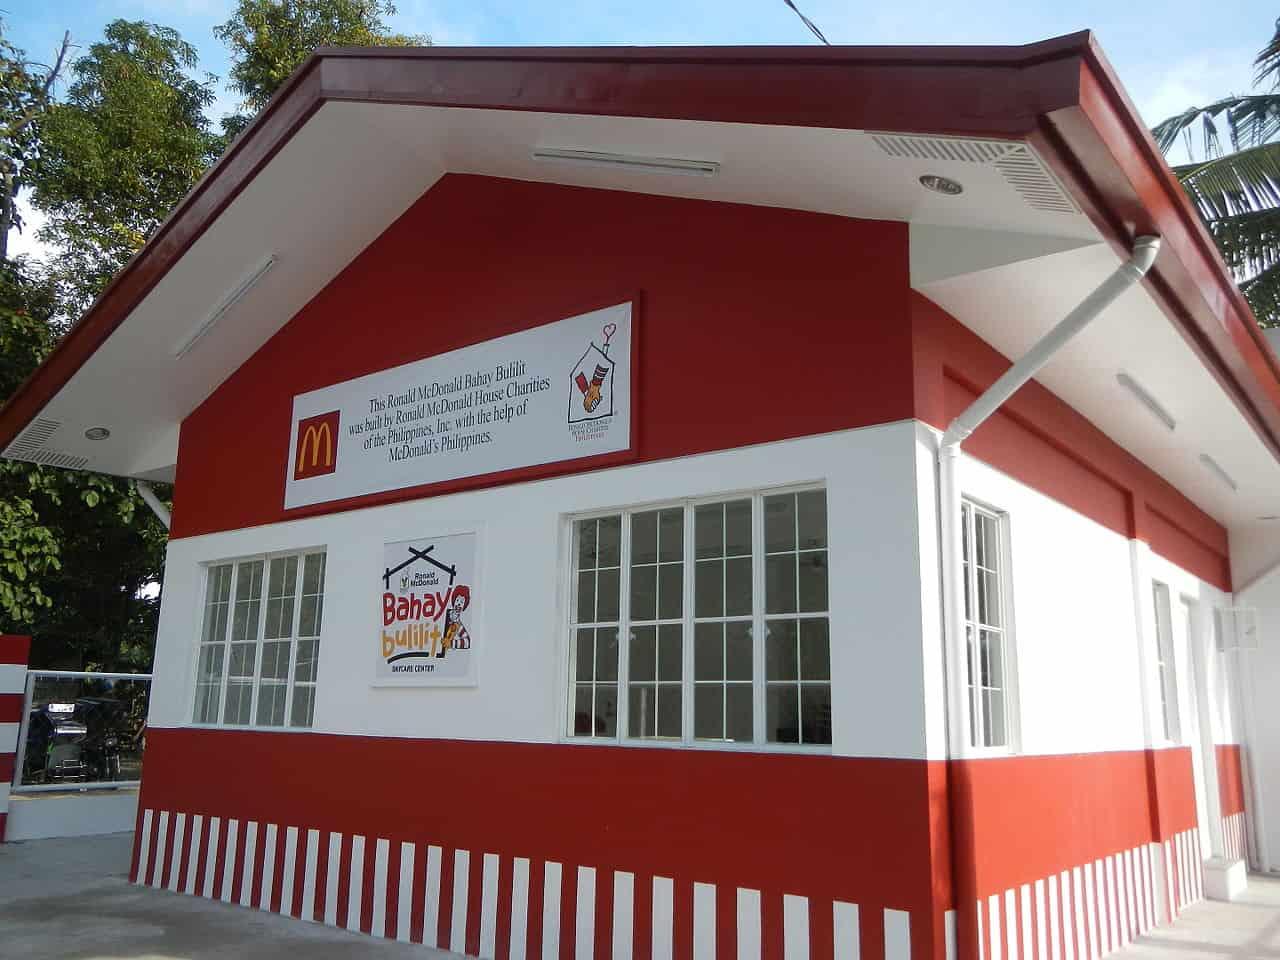 ronald mcdonald house of charities, mcdonald's facts